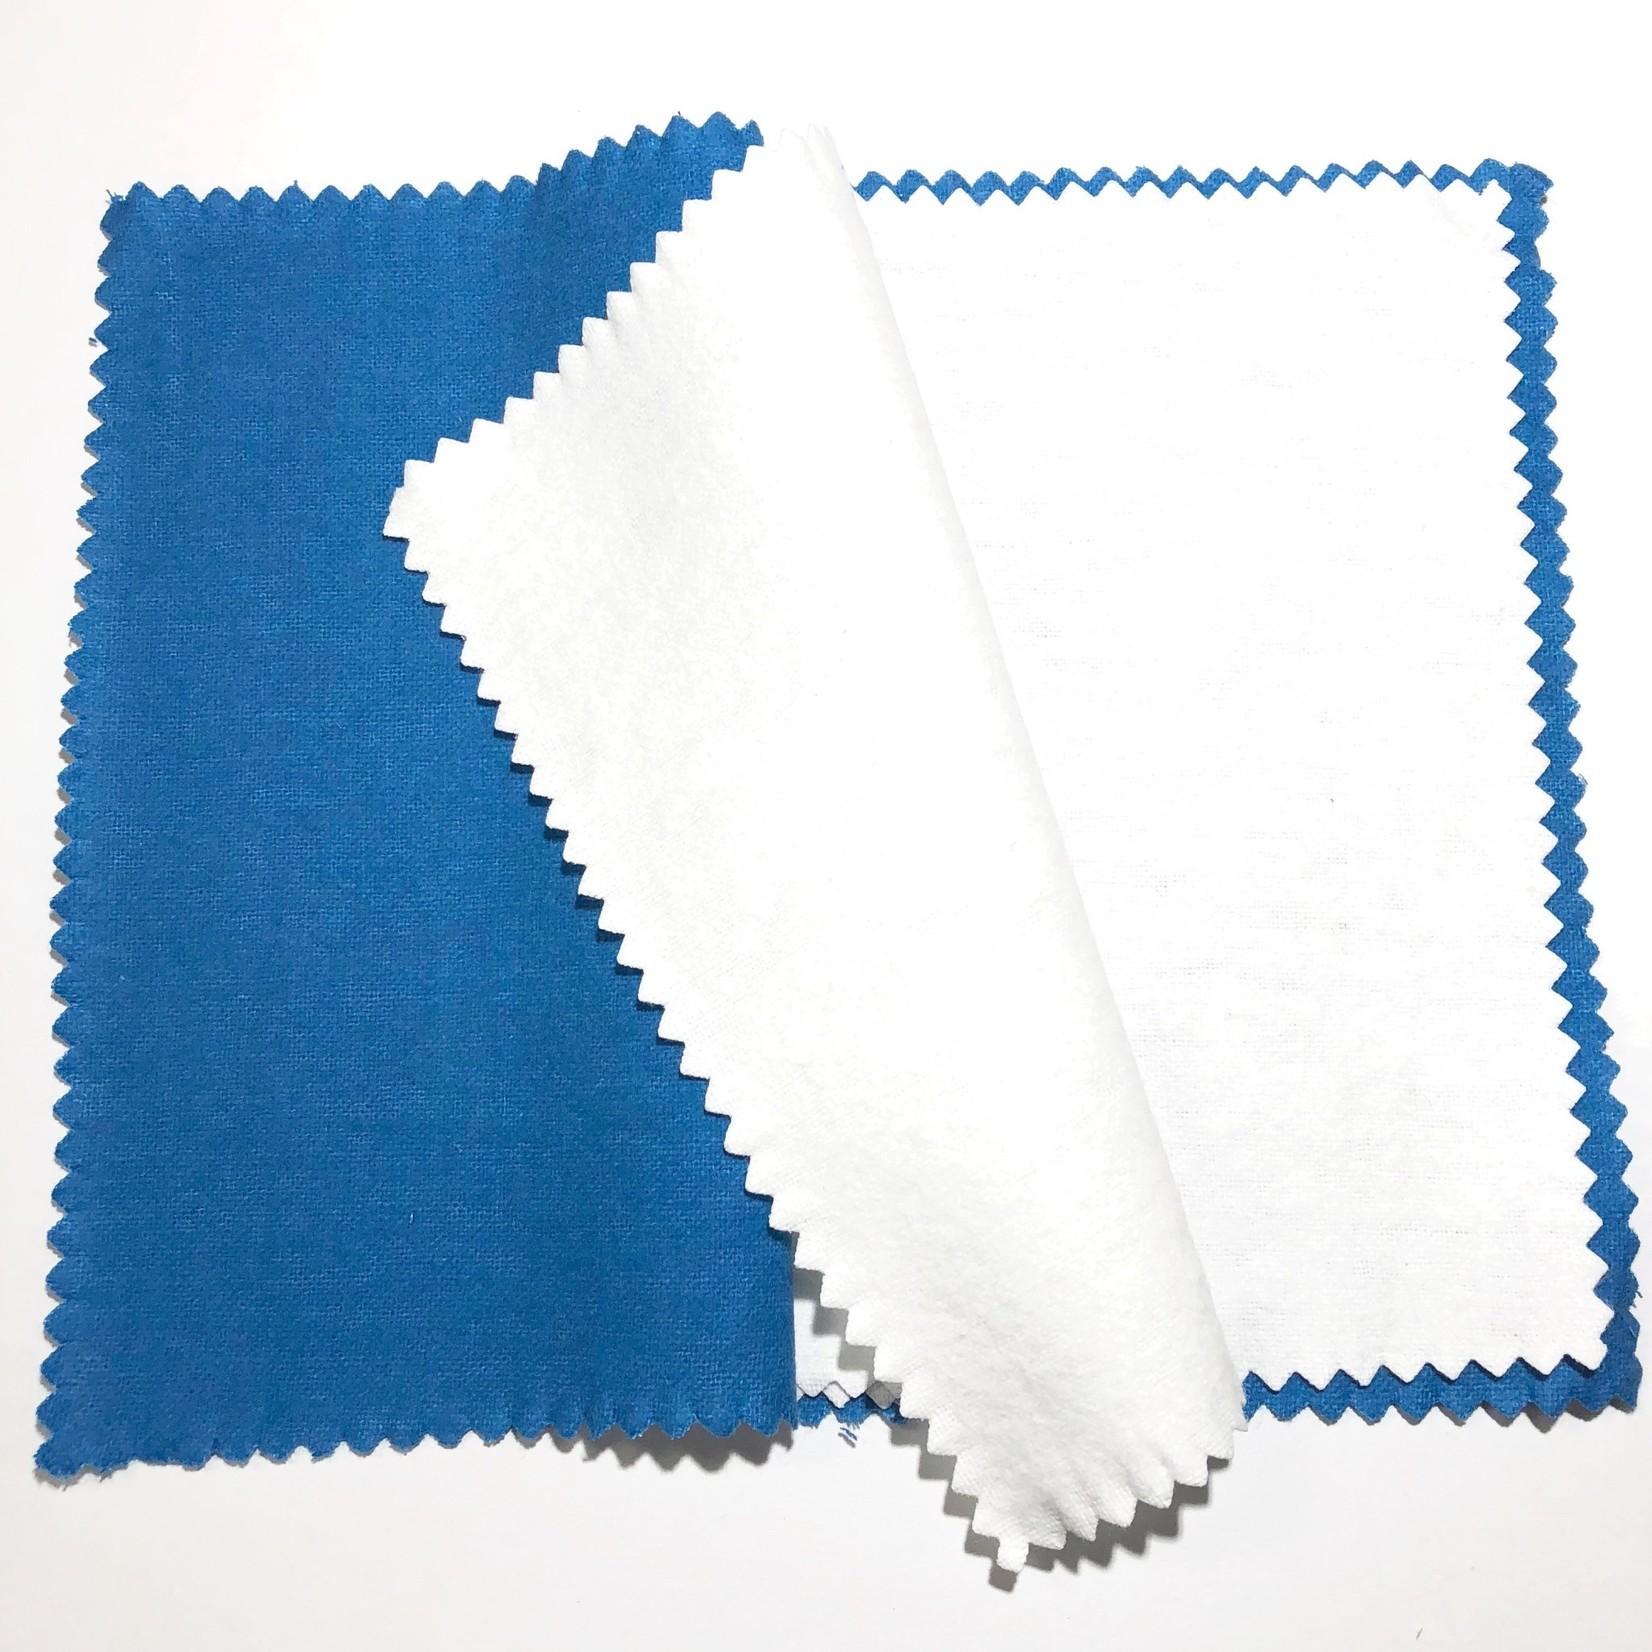 Jewelry Polishing Cloth 2-Sided